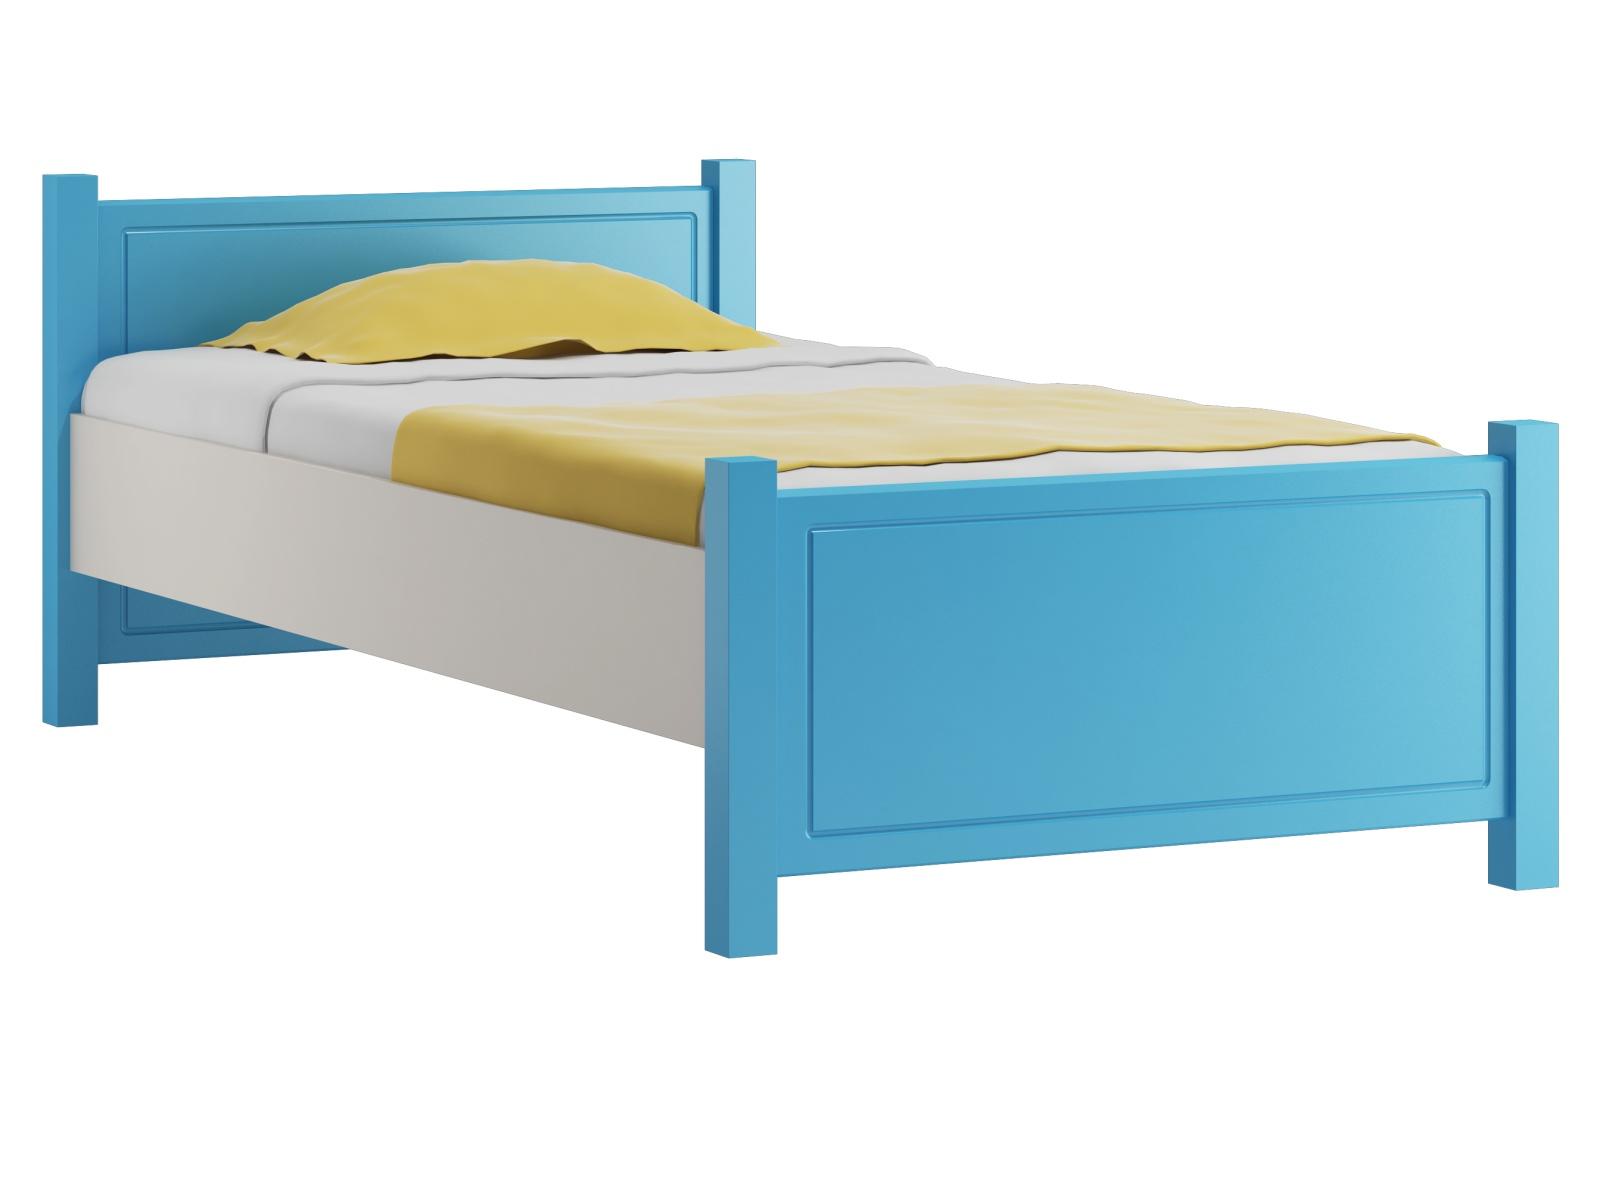 MAGNAT AMEKO postel 70x160 cm s roštem, masiv borovice